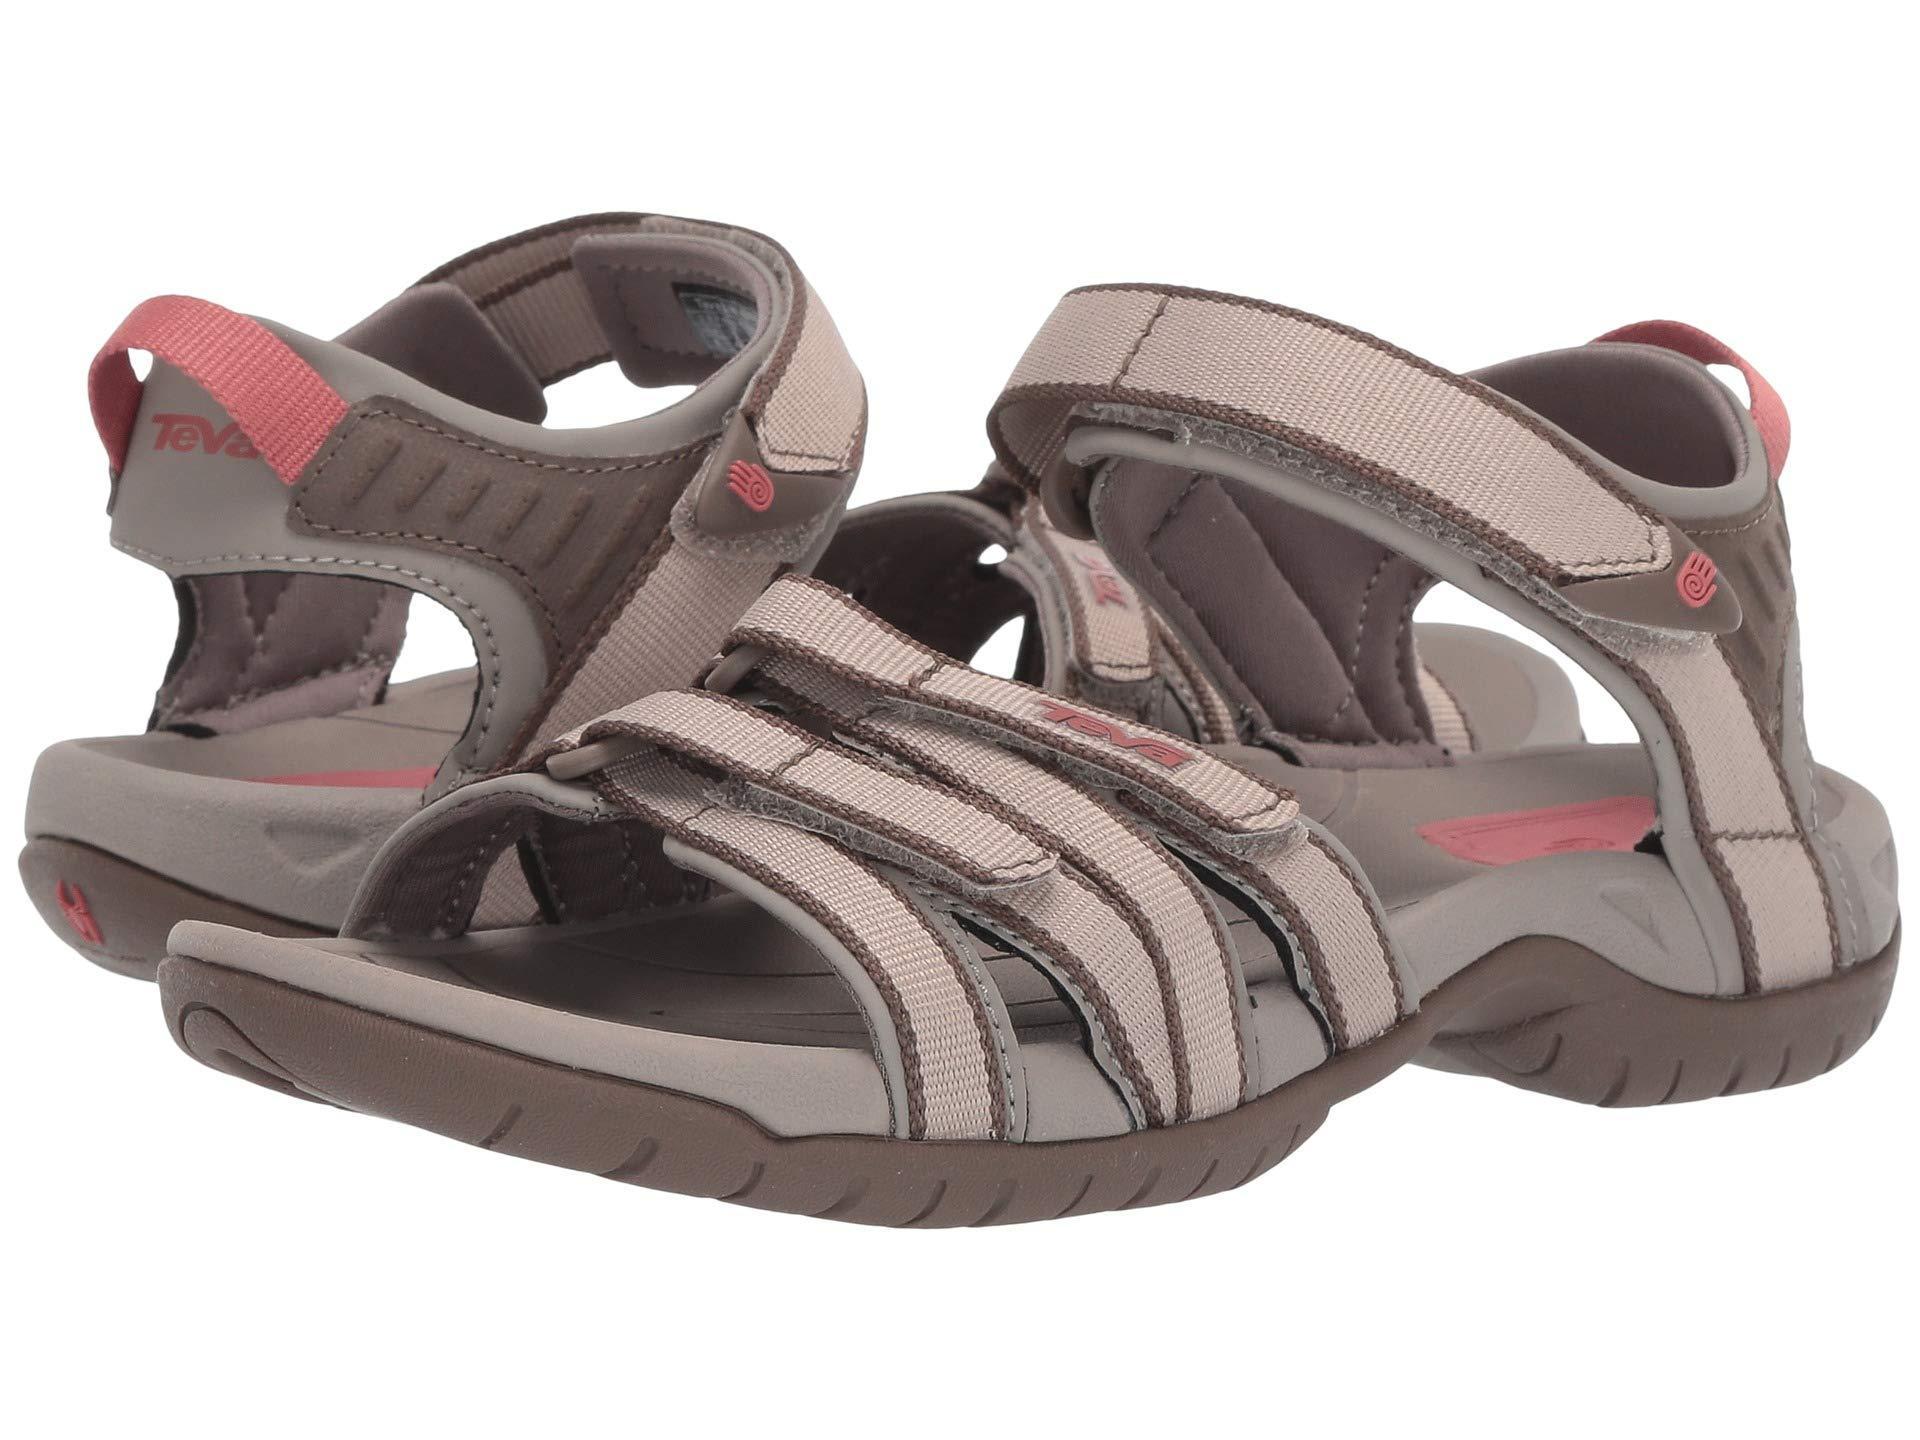 db216657206 Lyst - Teva Tirra (hera Gray Mist) Women's Sandals in Brown